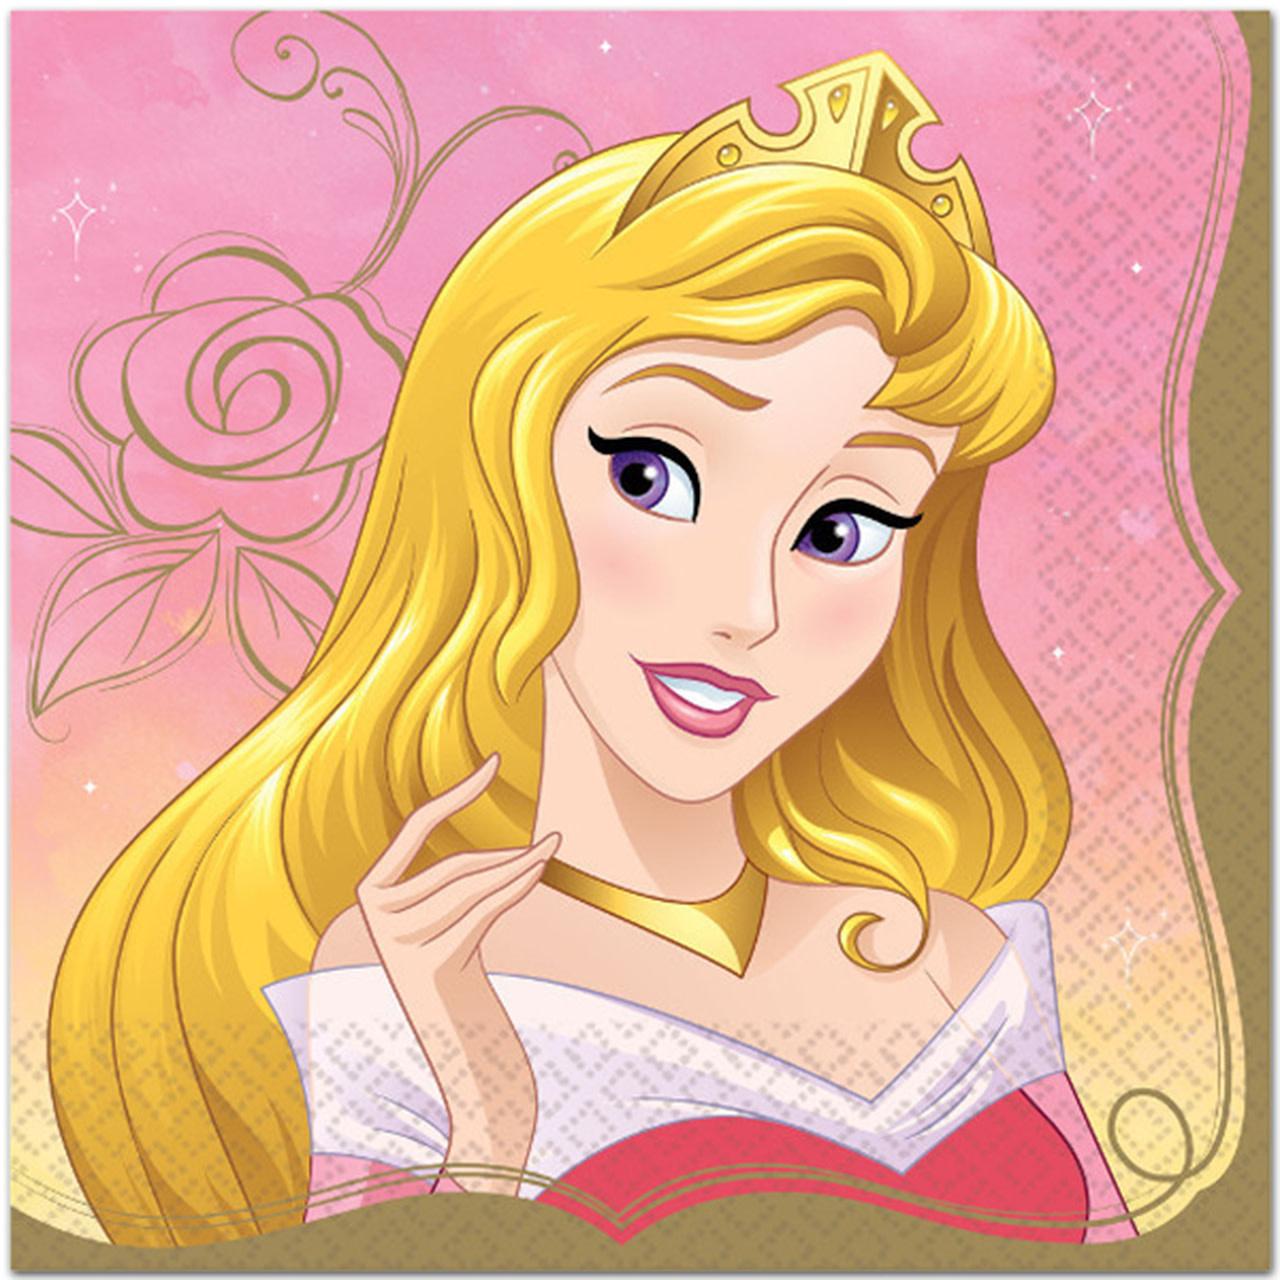 Disney Princess Aurora Lunch Napkins - 16ct